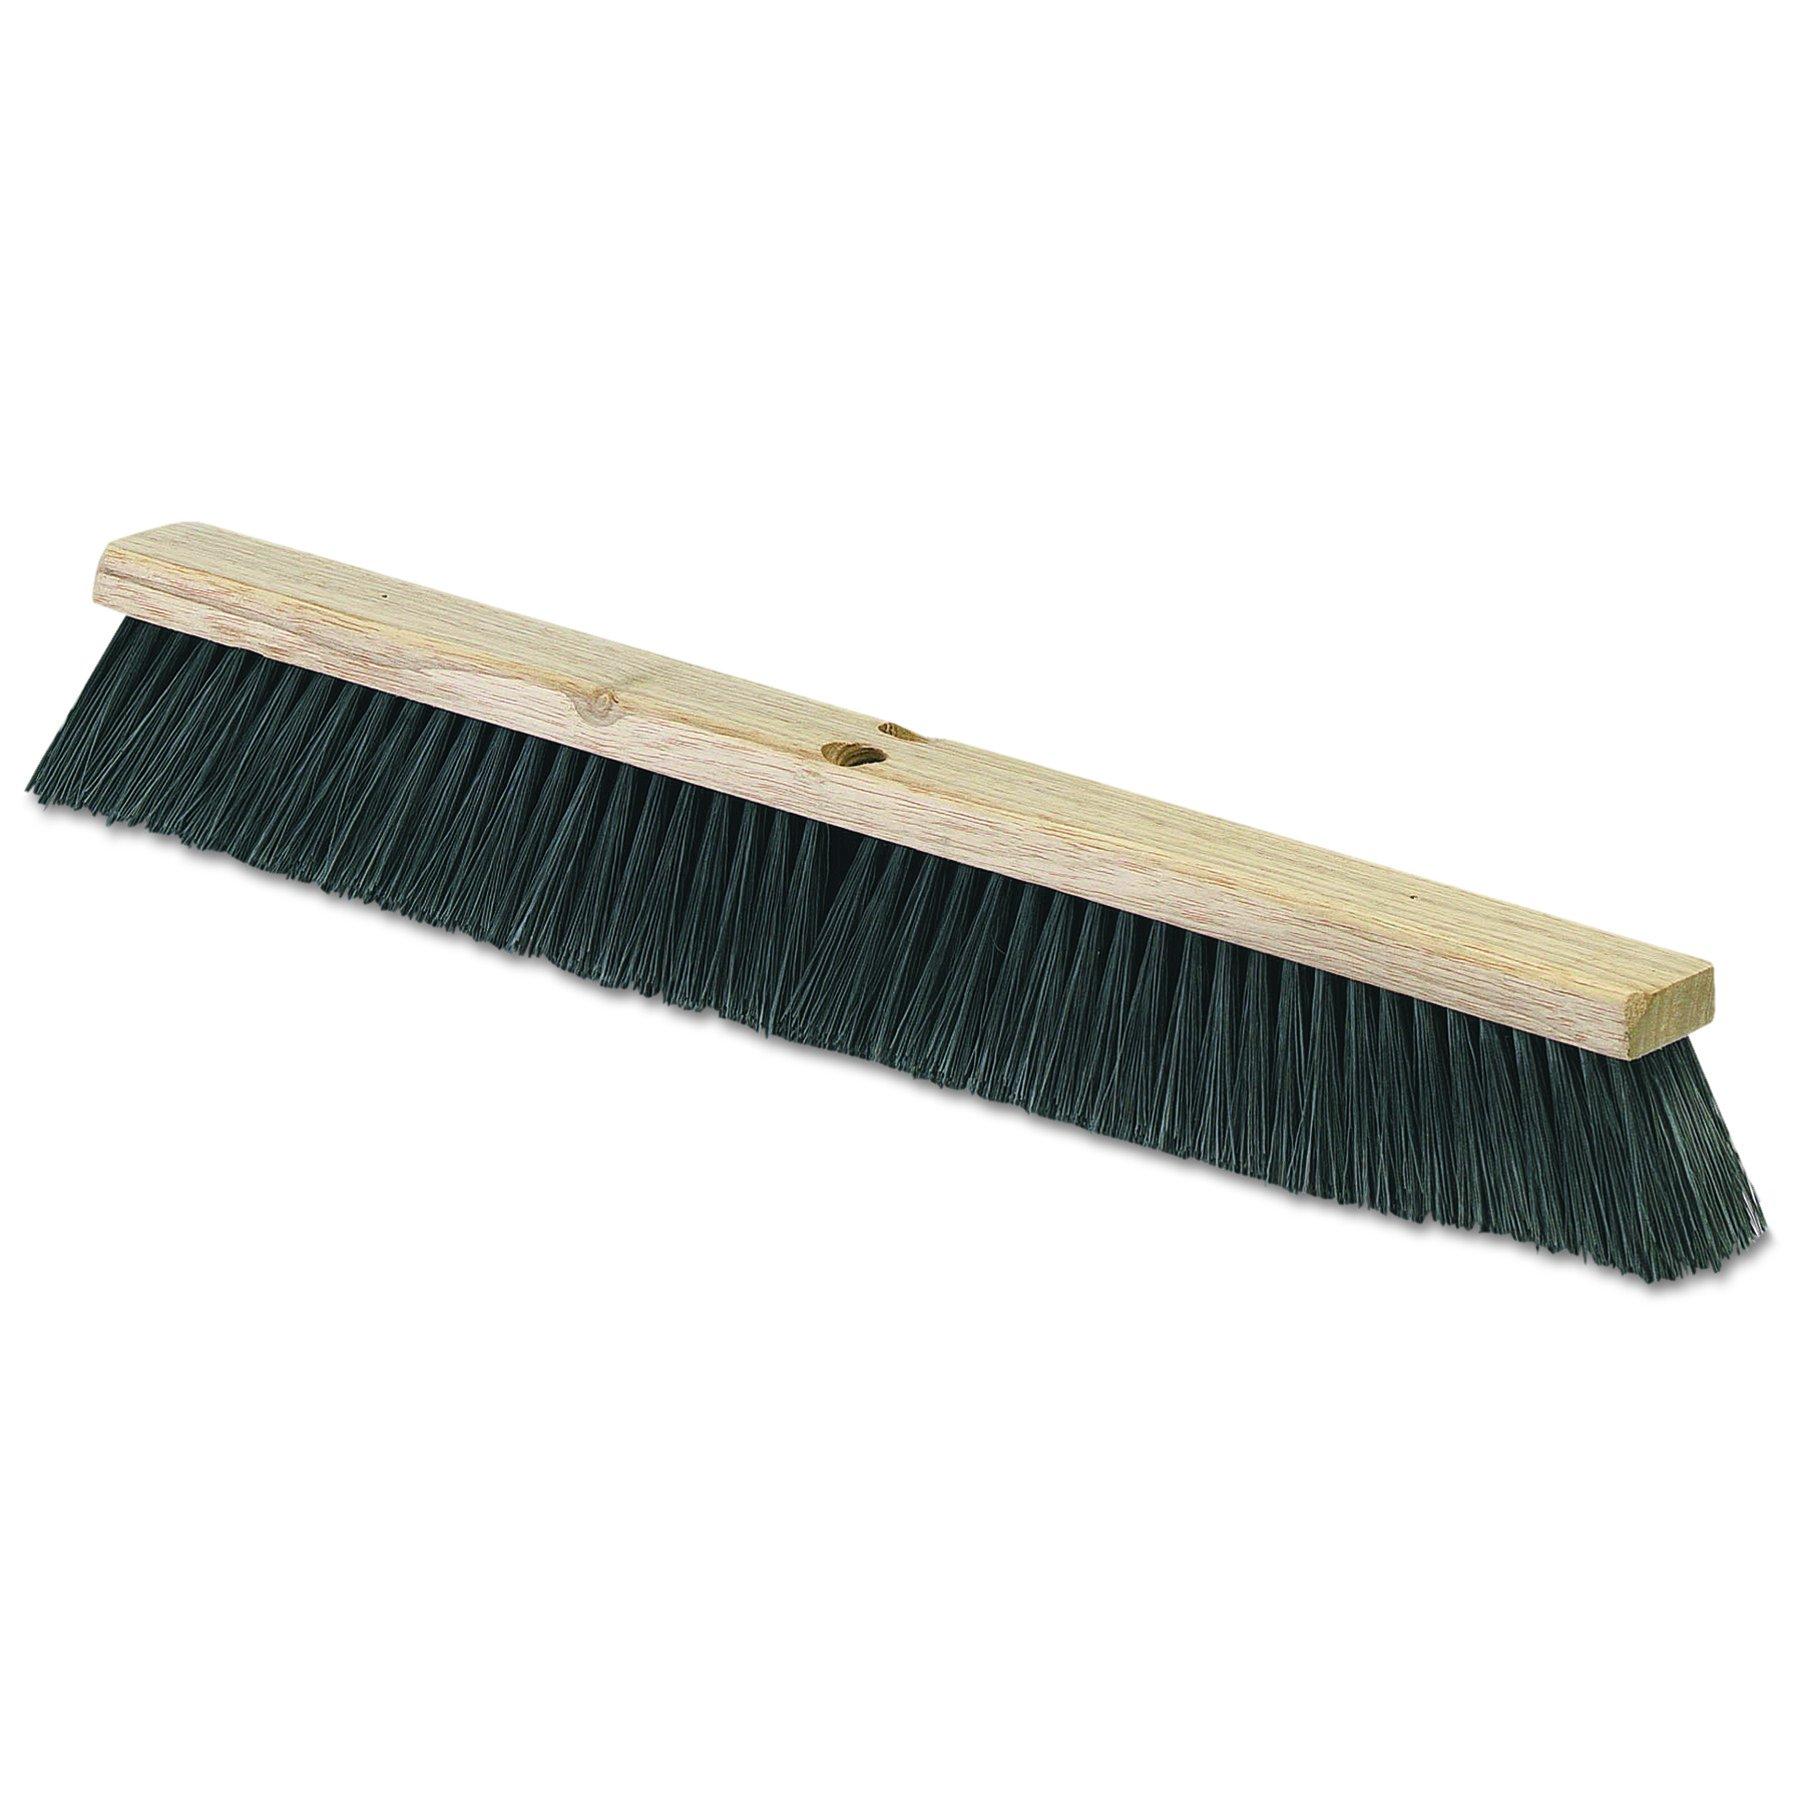 Carlisle 4507403 Fine/Medium Floor Sweeps, Black, 36'' x 3'', Polypropylene